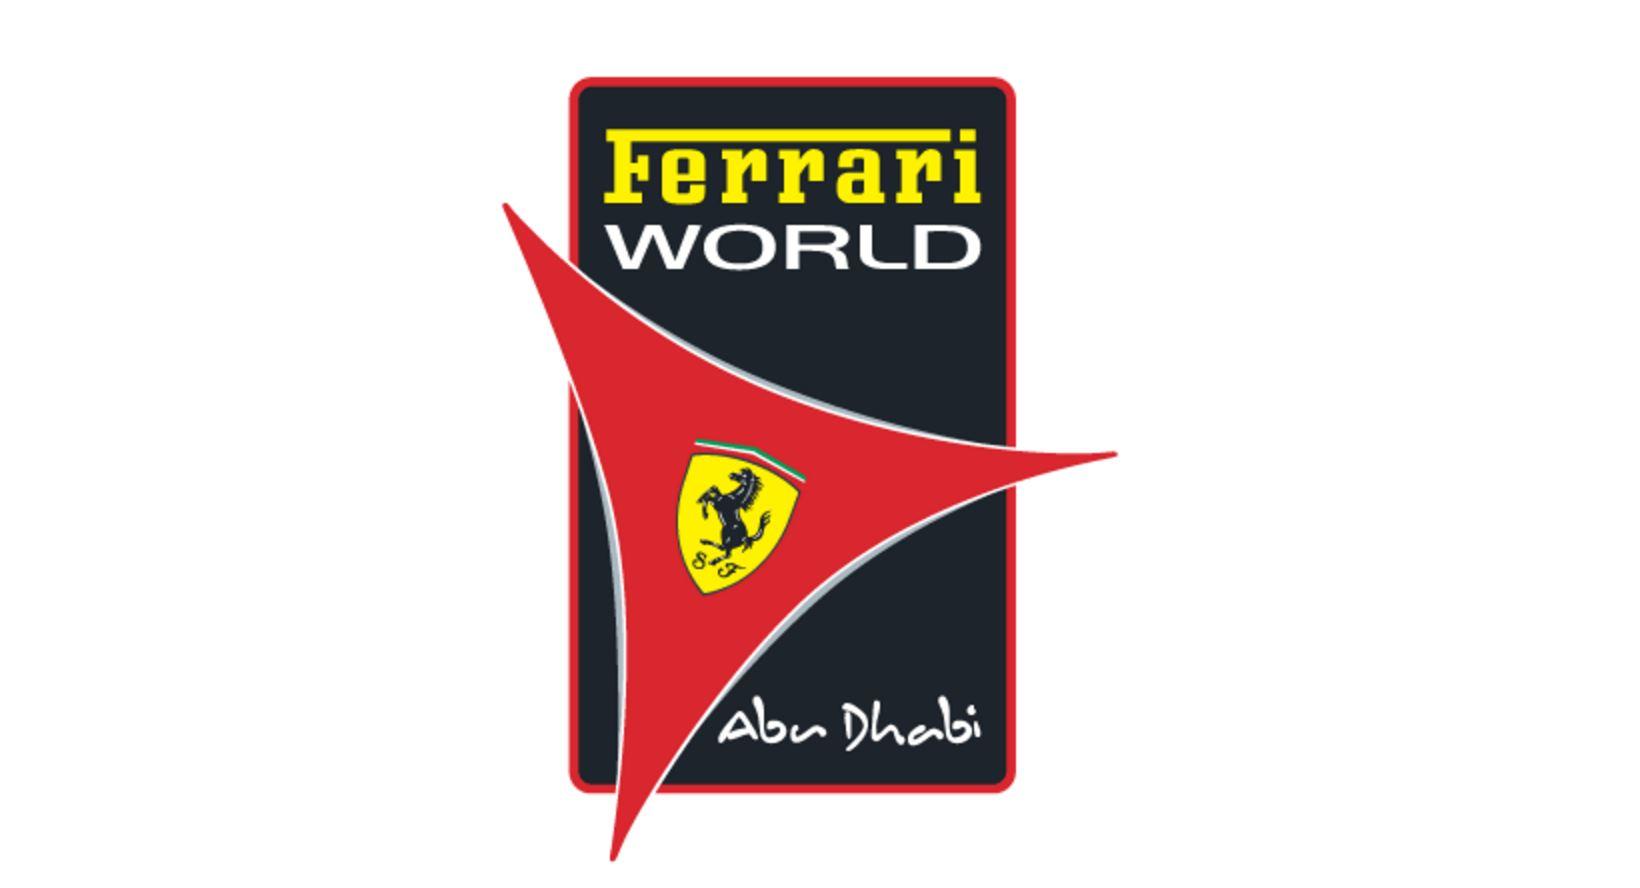 Abu Dhabi Logo Vector Png Hdpng.com 1640 - Abu Dhabi Vector, Transparent background PNG HD thumbnail